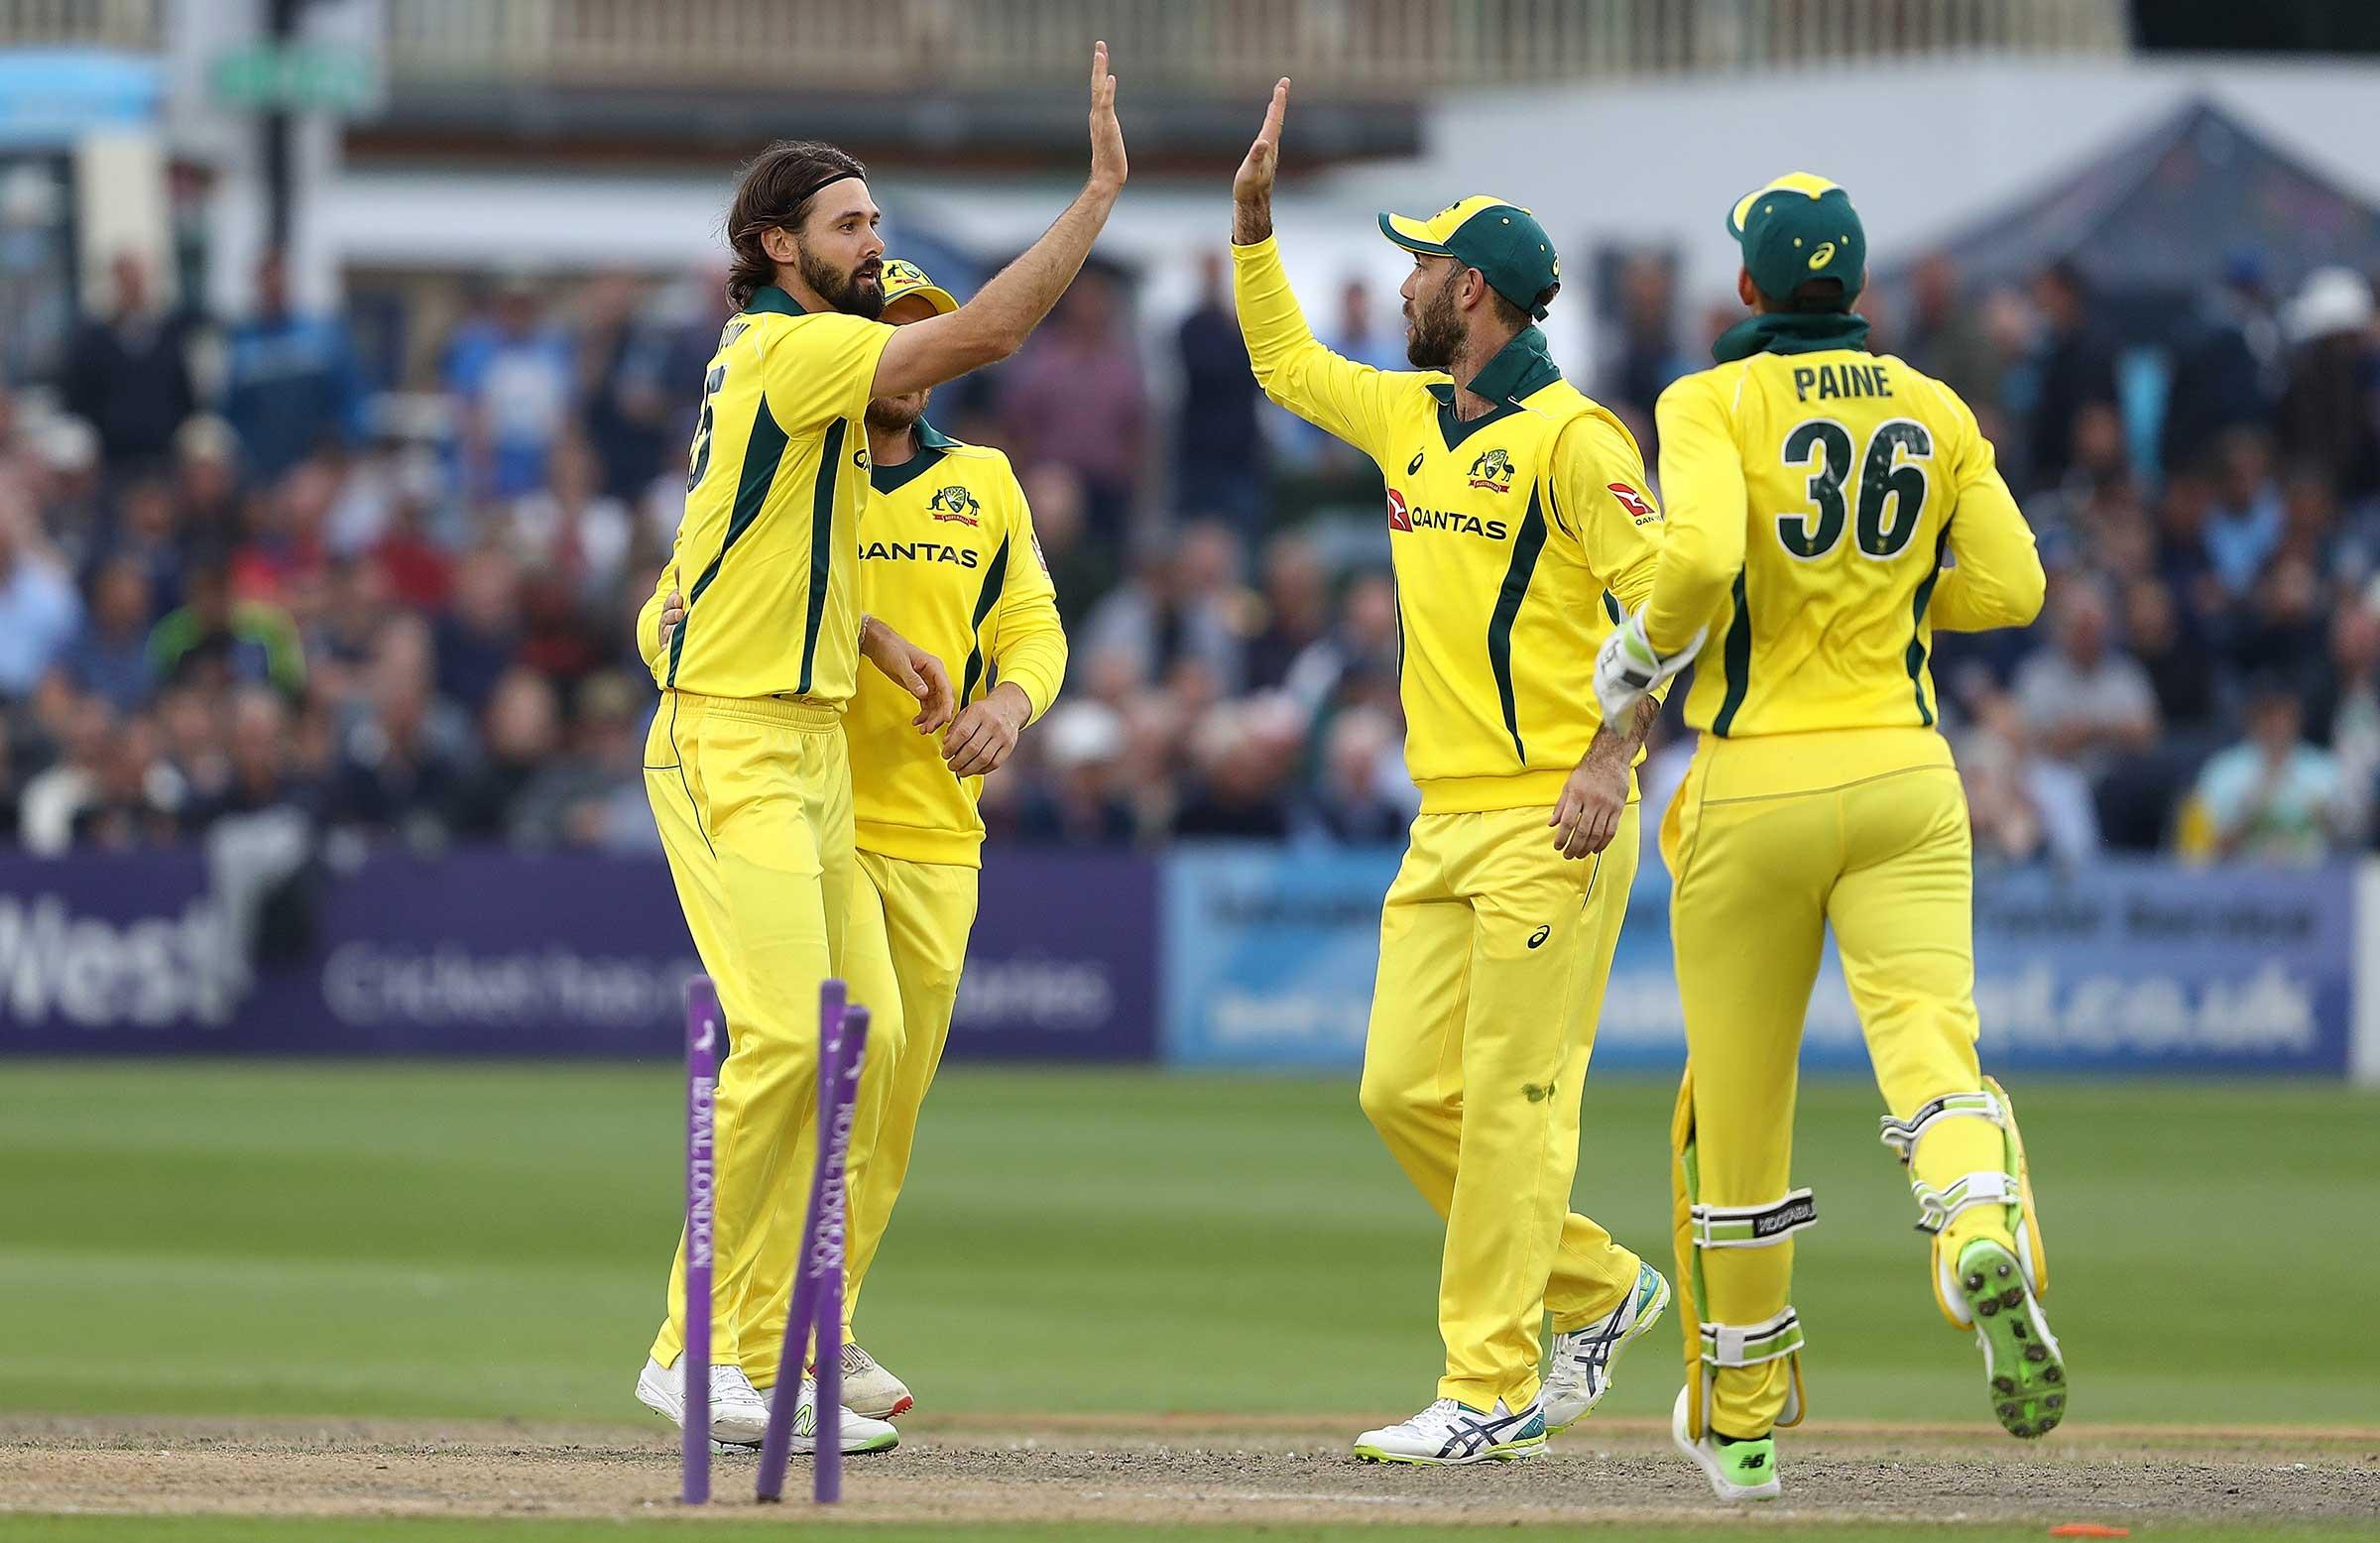 Richardson celebrates his wicket // Getty